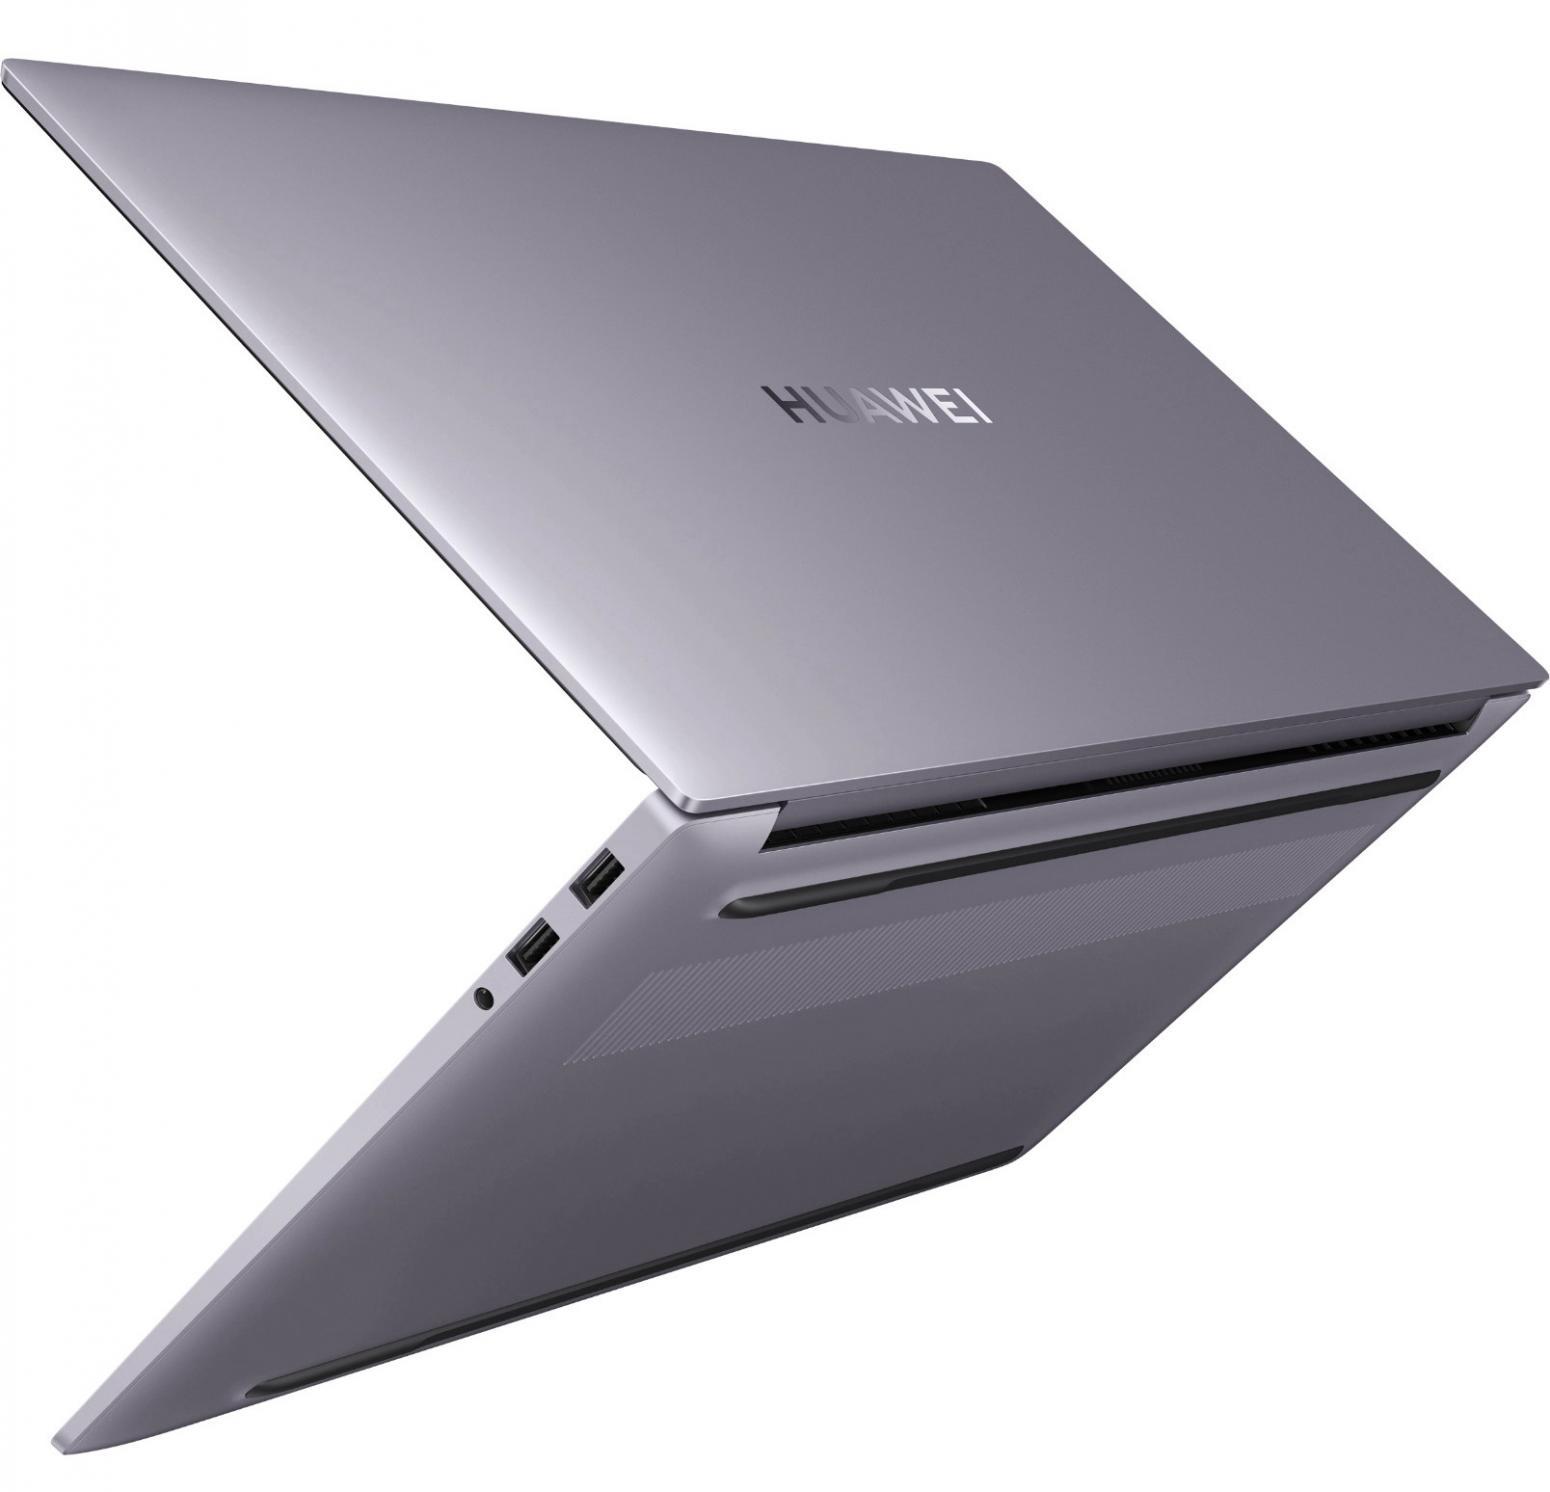 Ordinateur portable Huawei Matebook D16 (2021) Gris - photo 4